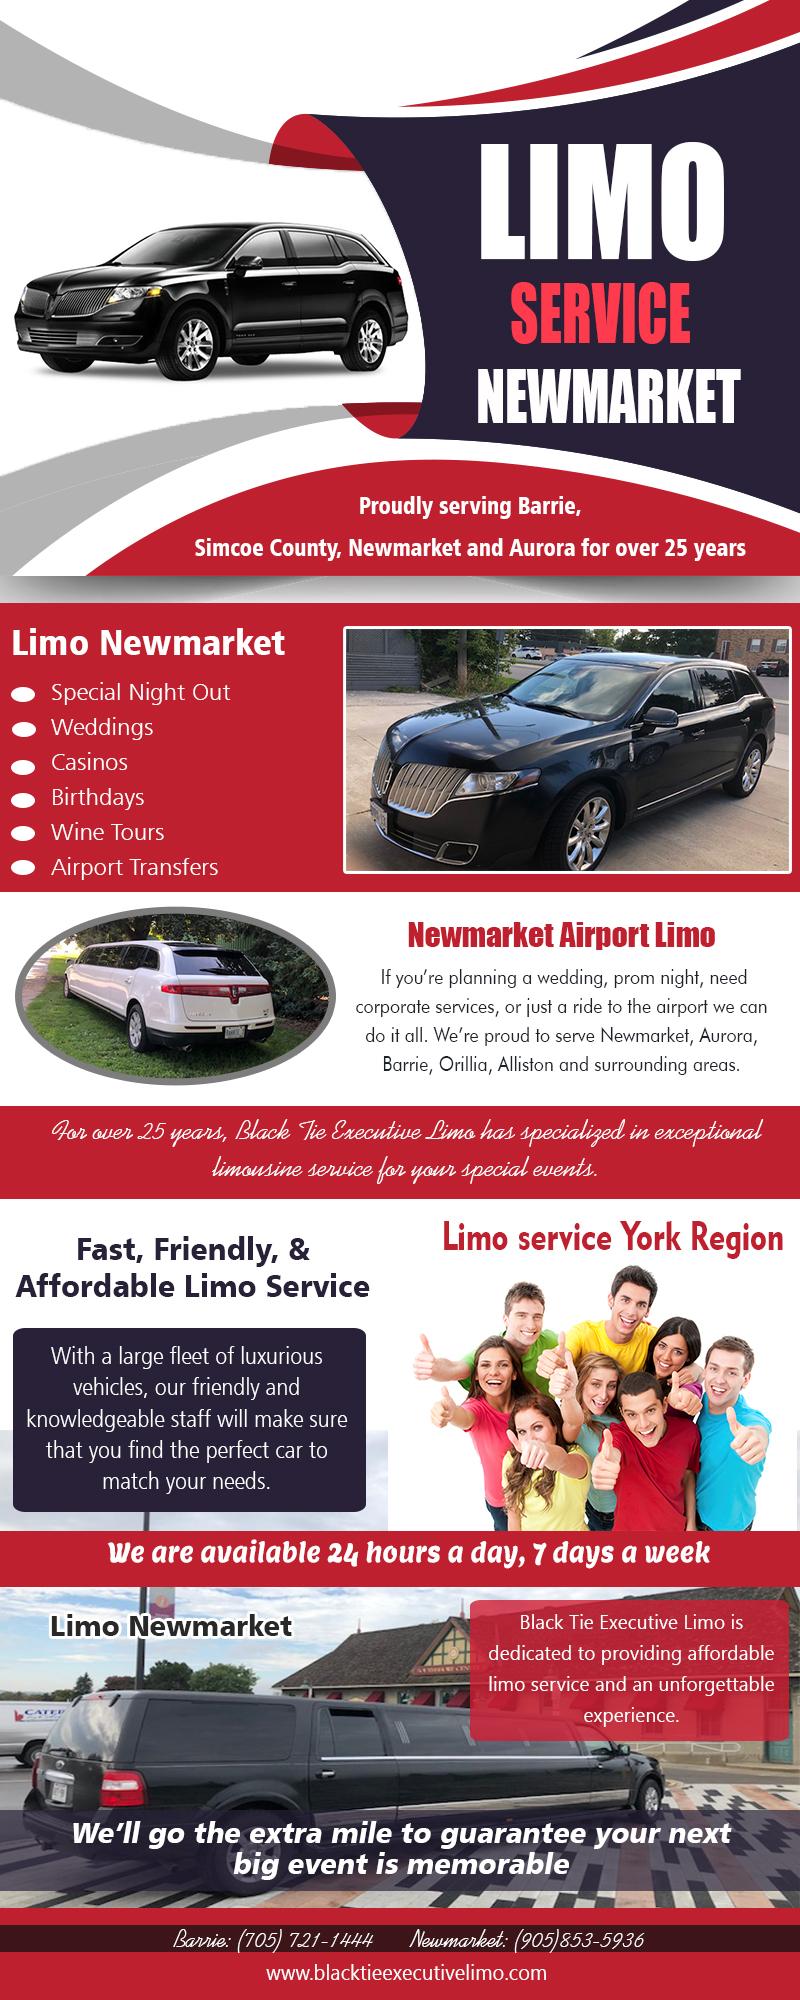 Limo Newmarket | Call – 705-721-1444 | blacktieexecutivelimo.com